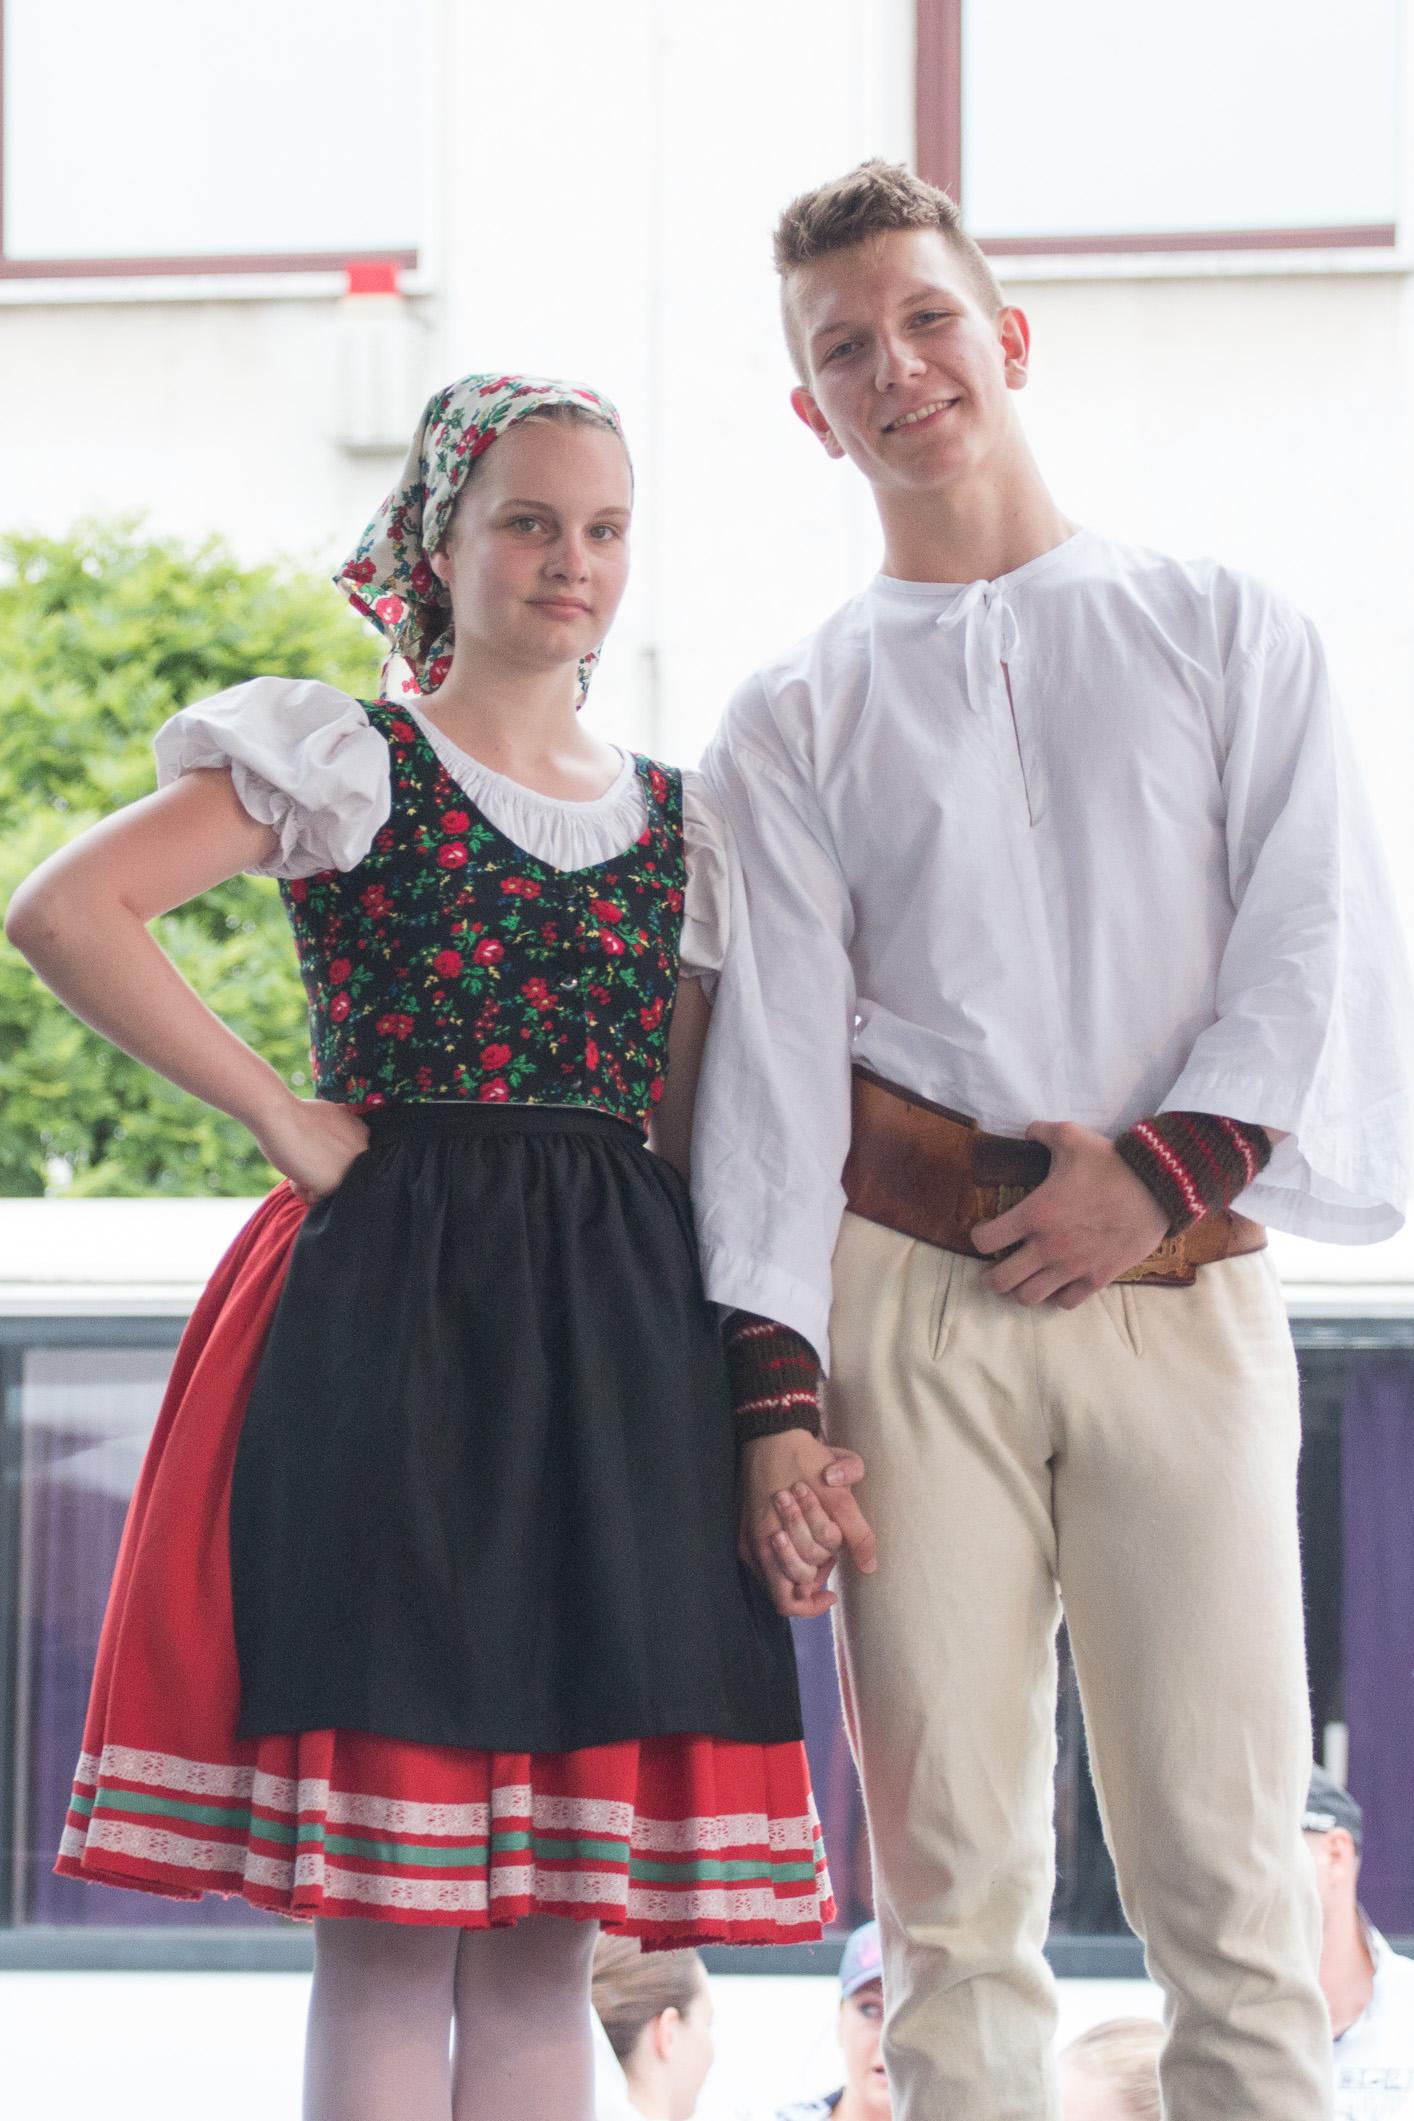 folklor-korzo-2016-zvolen-10